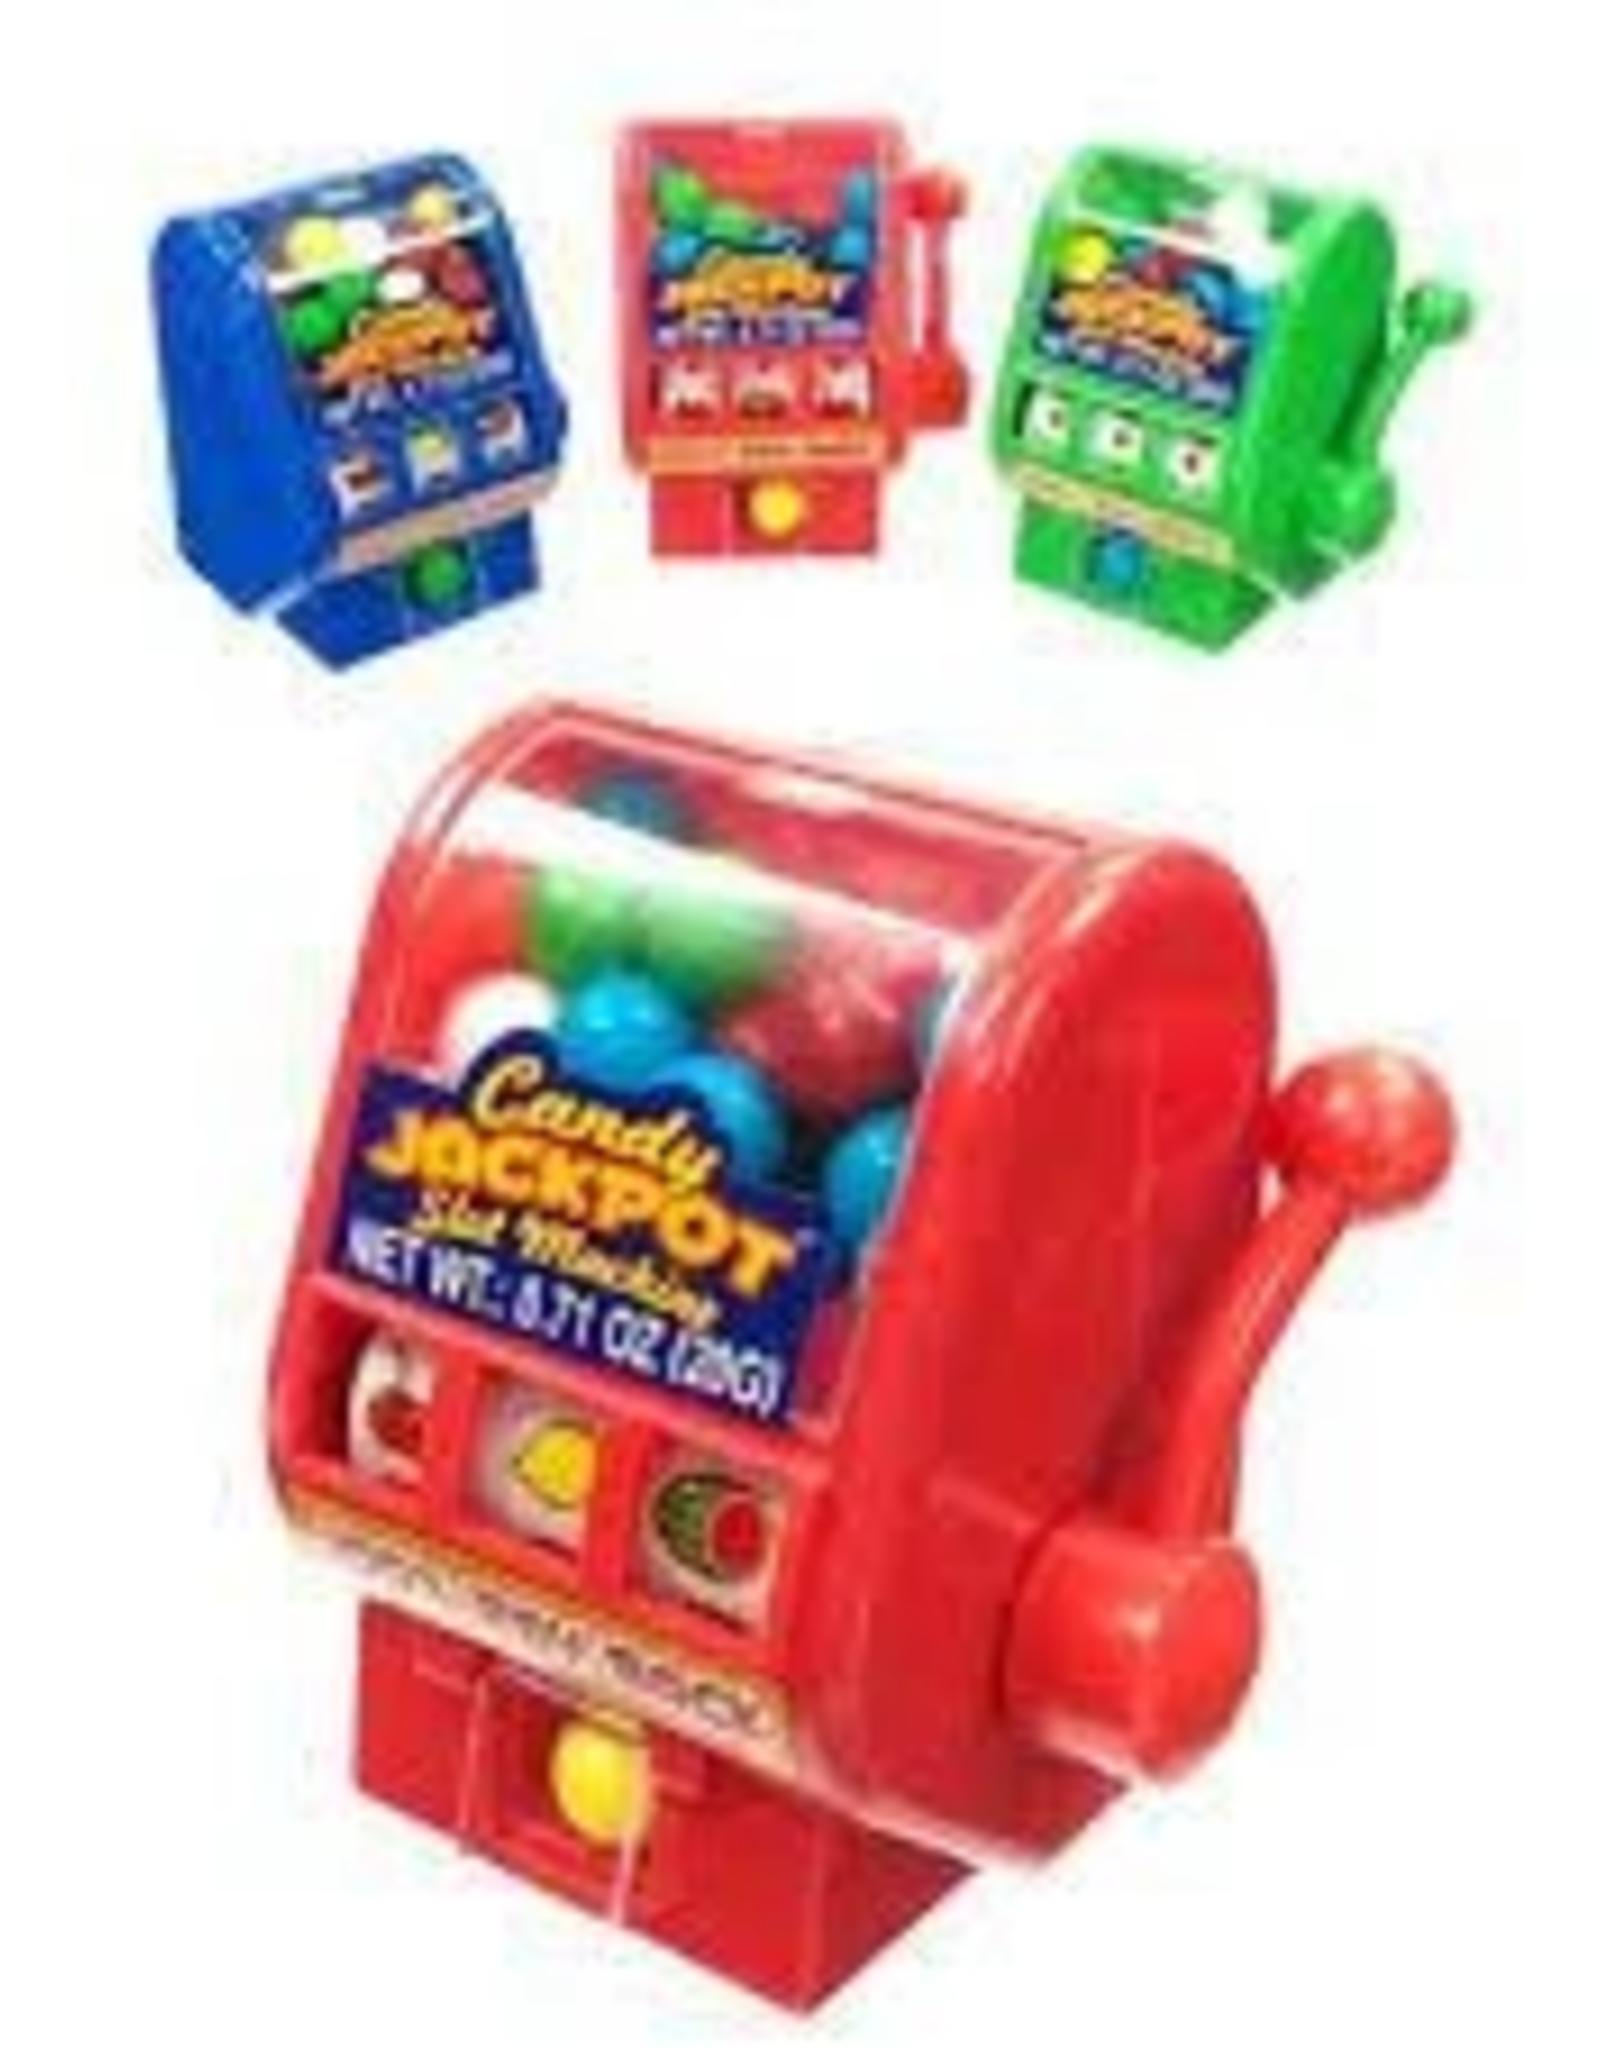 Kidsmania Kidsmania Jackpot Slot Machine .71oz